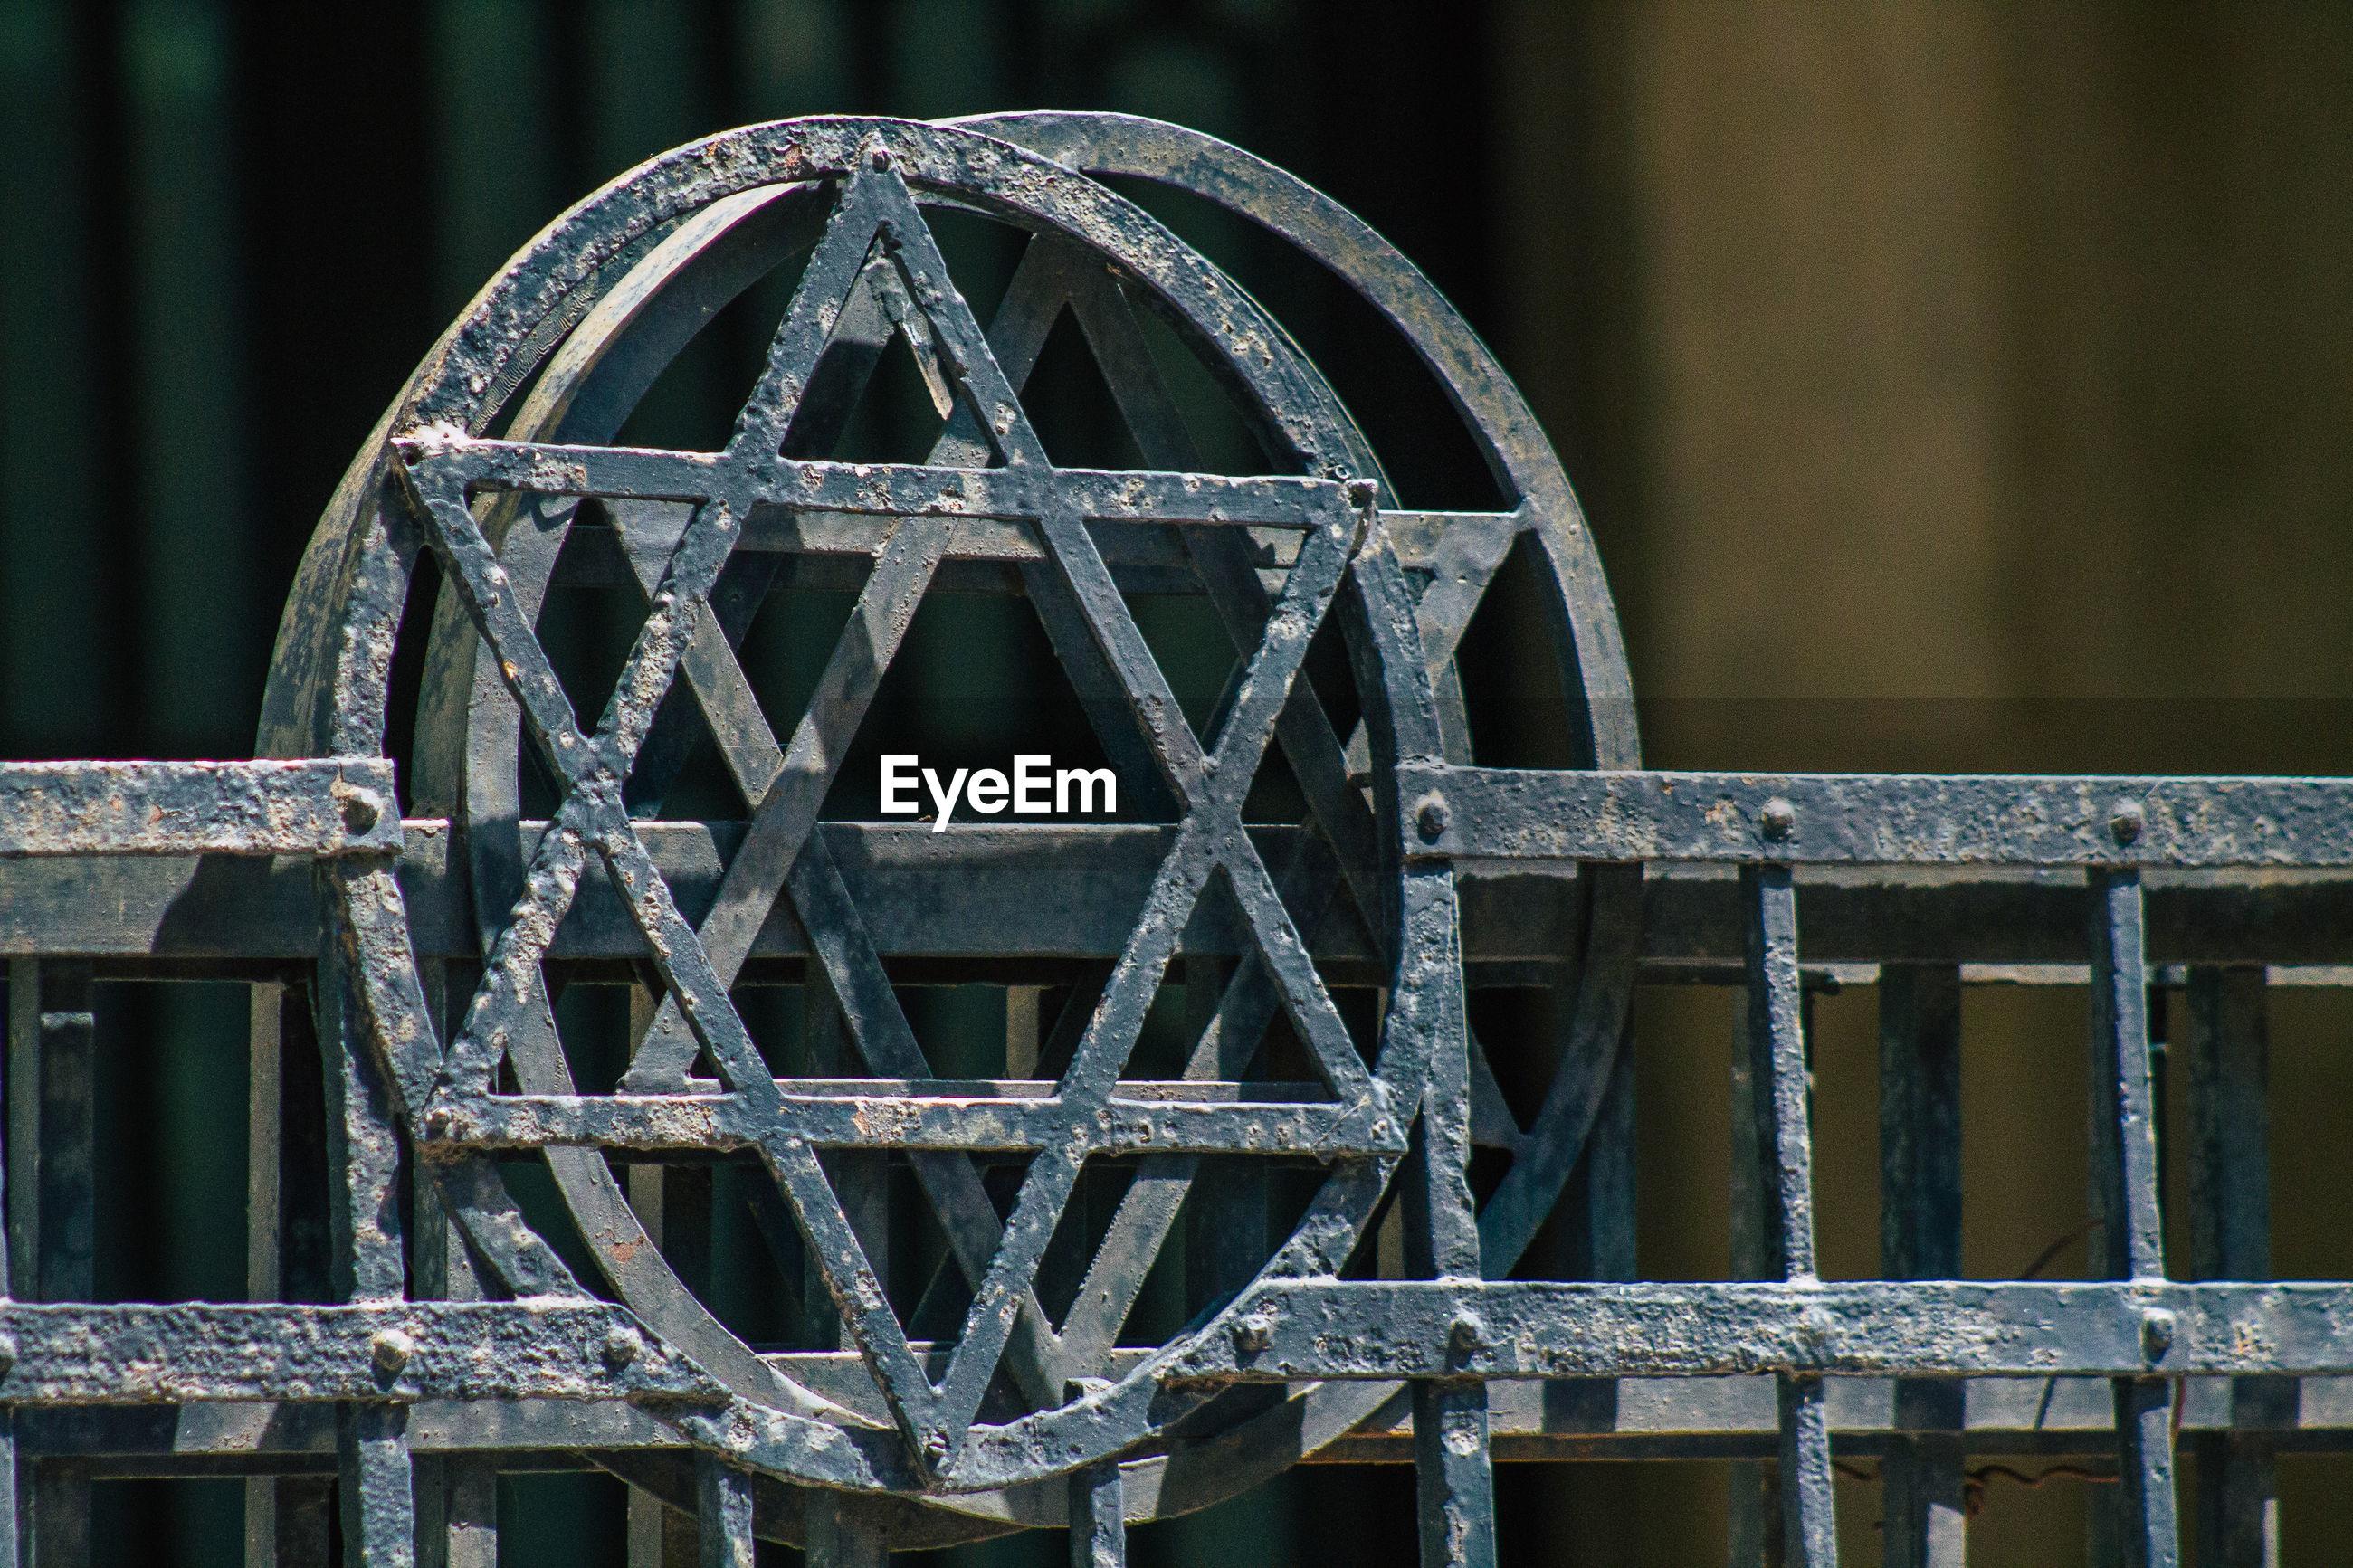 CLOSE-UP OF METALLIC GATE